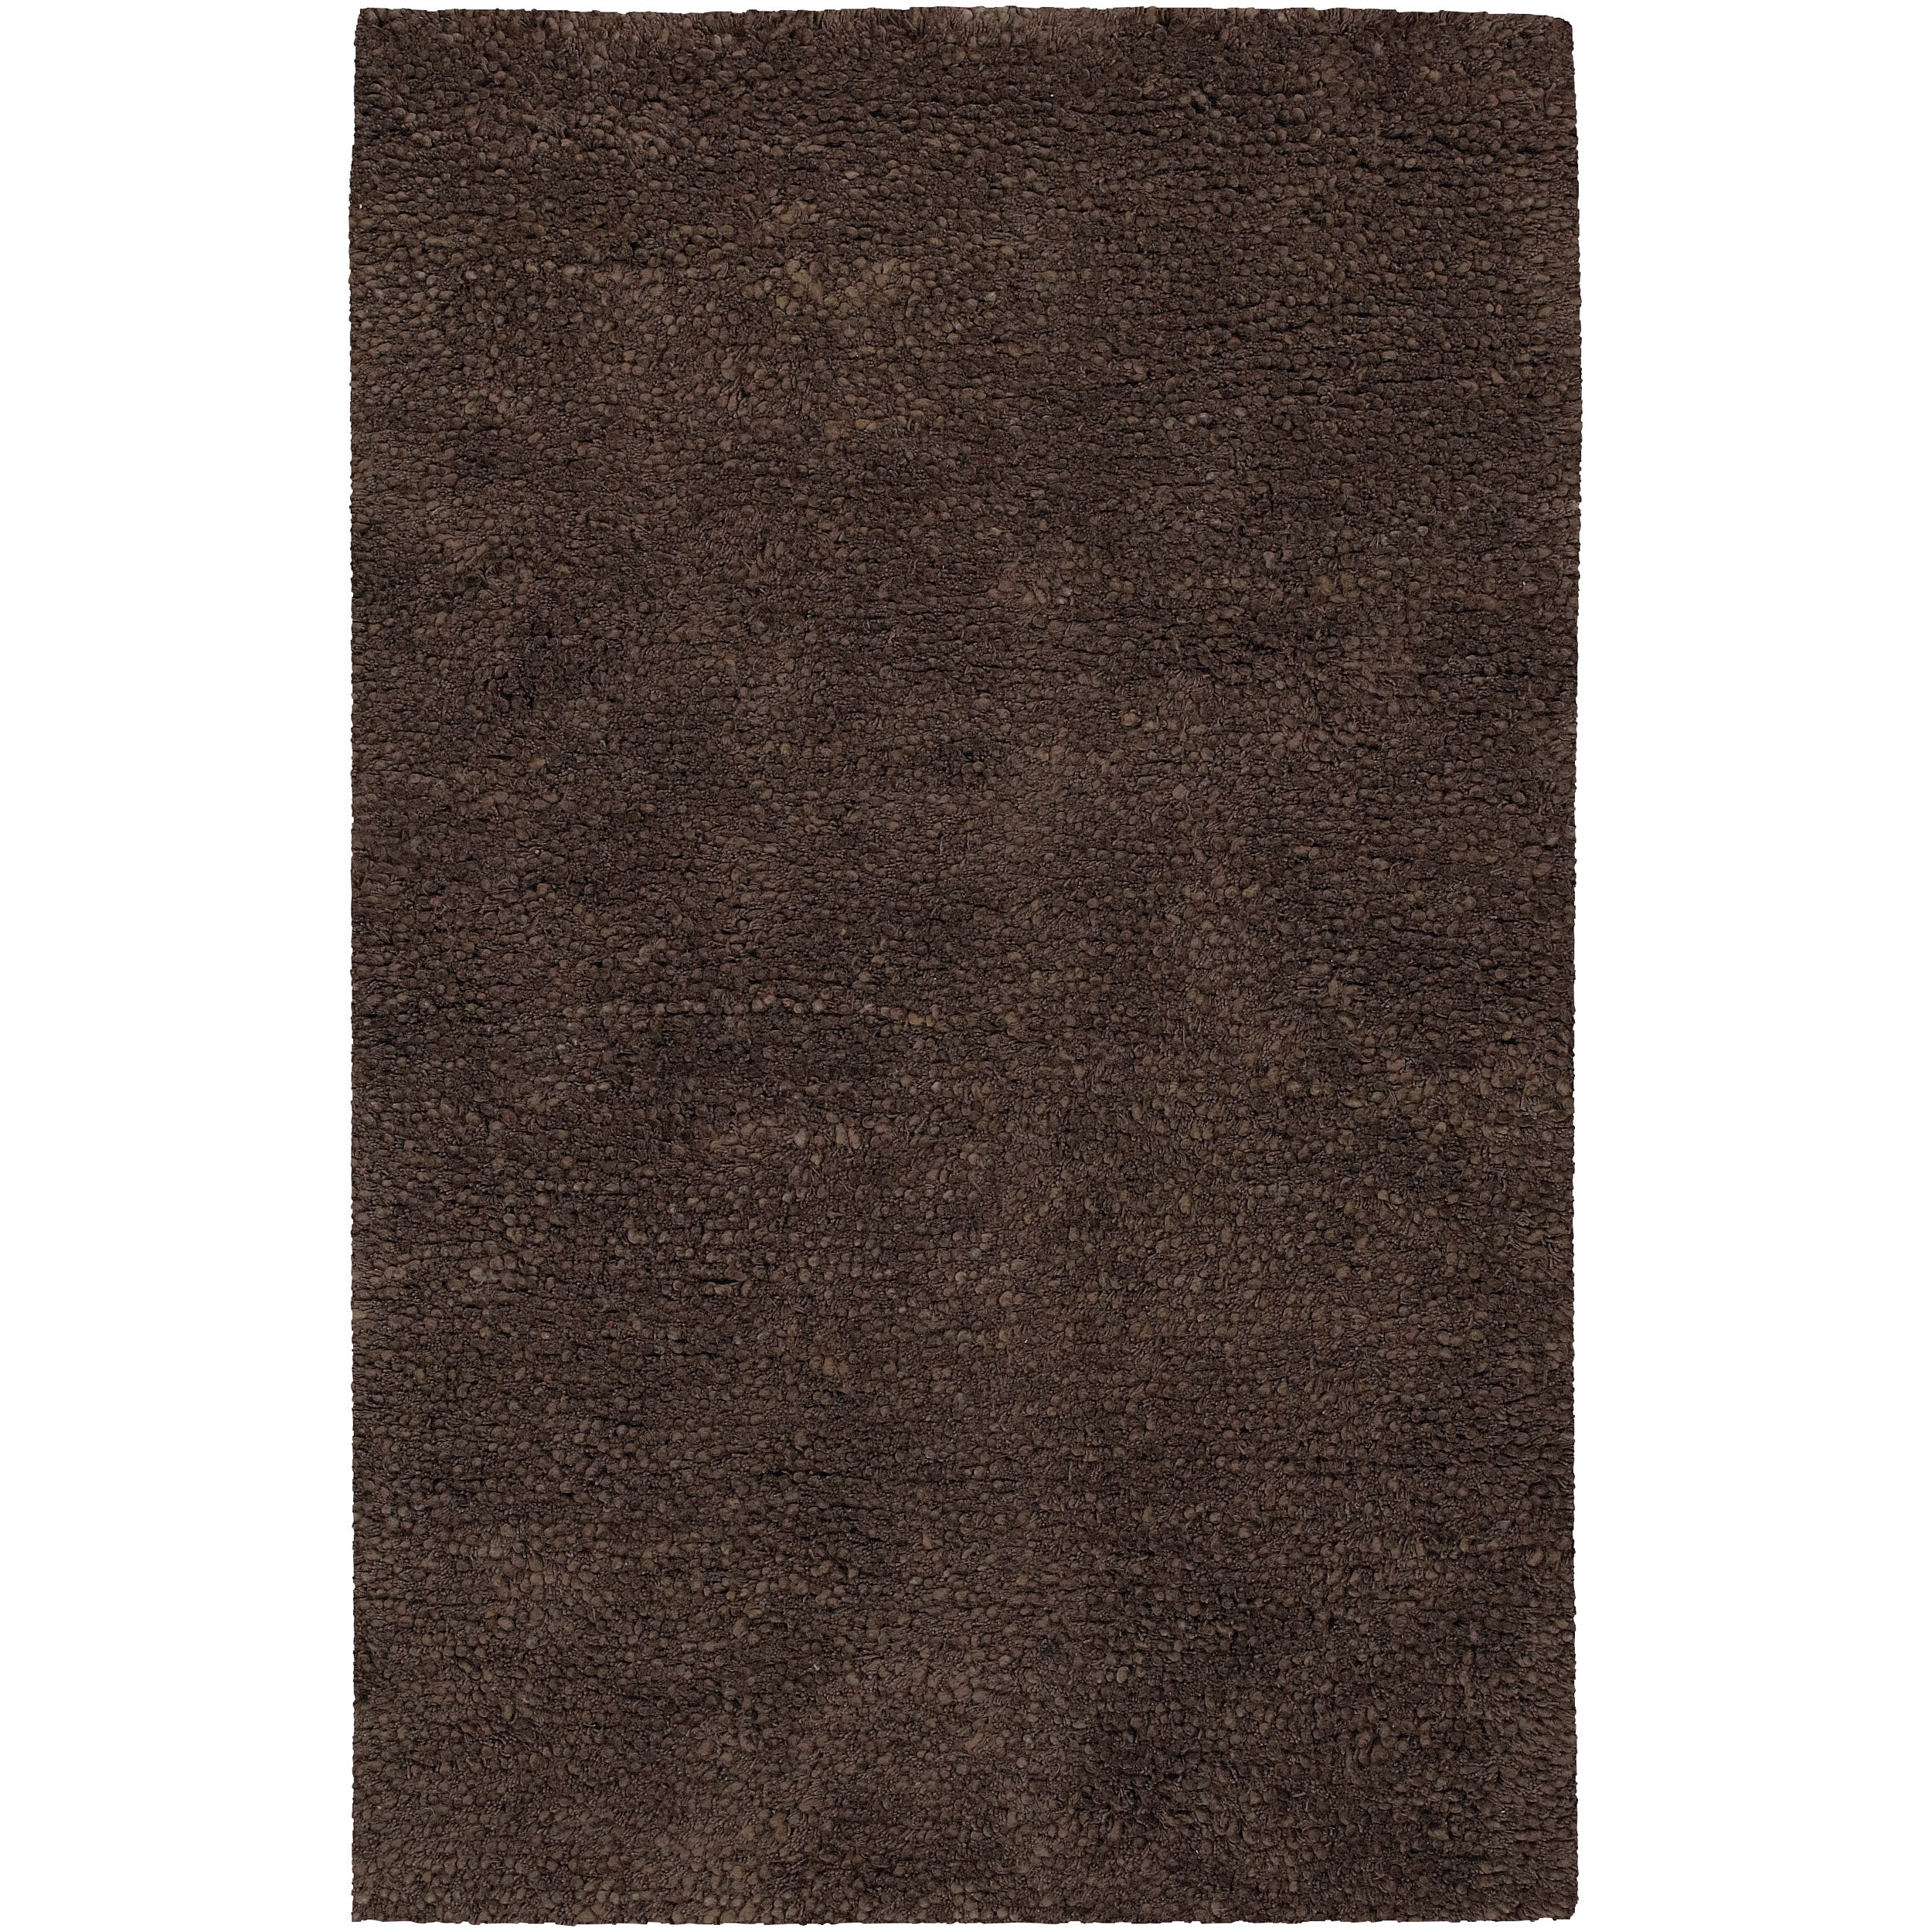 Hand-woven Metropoli Black New Zealand Wool Plush Shag Rug (3'6x 5'6)